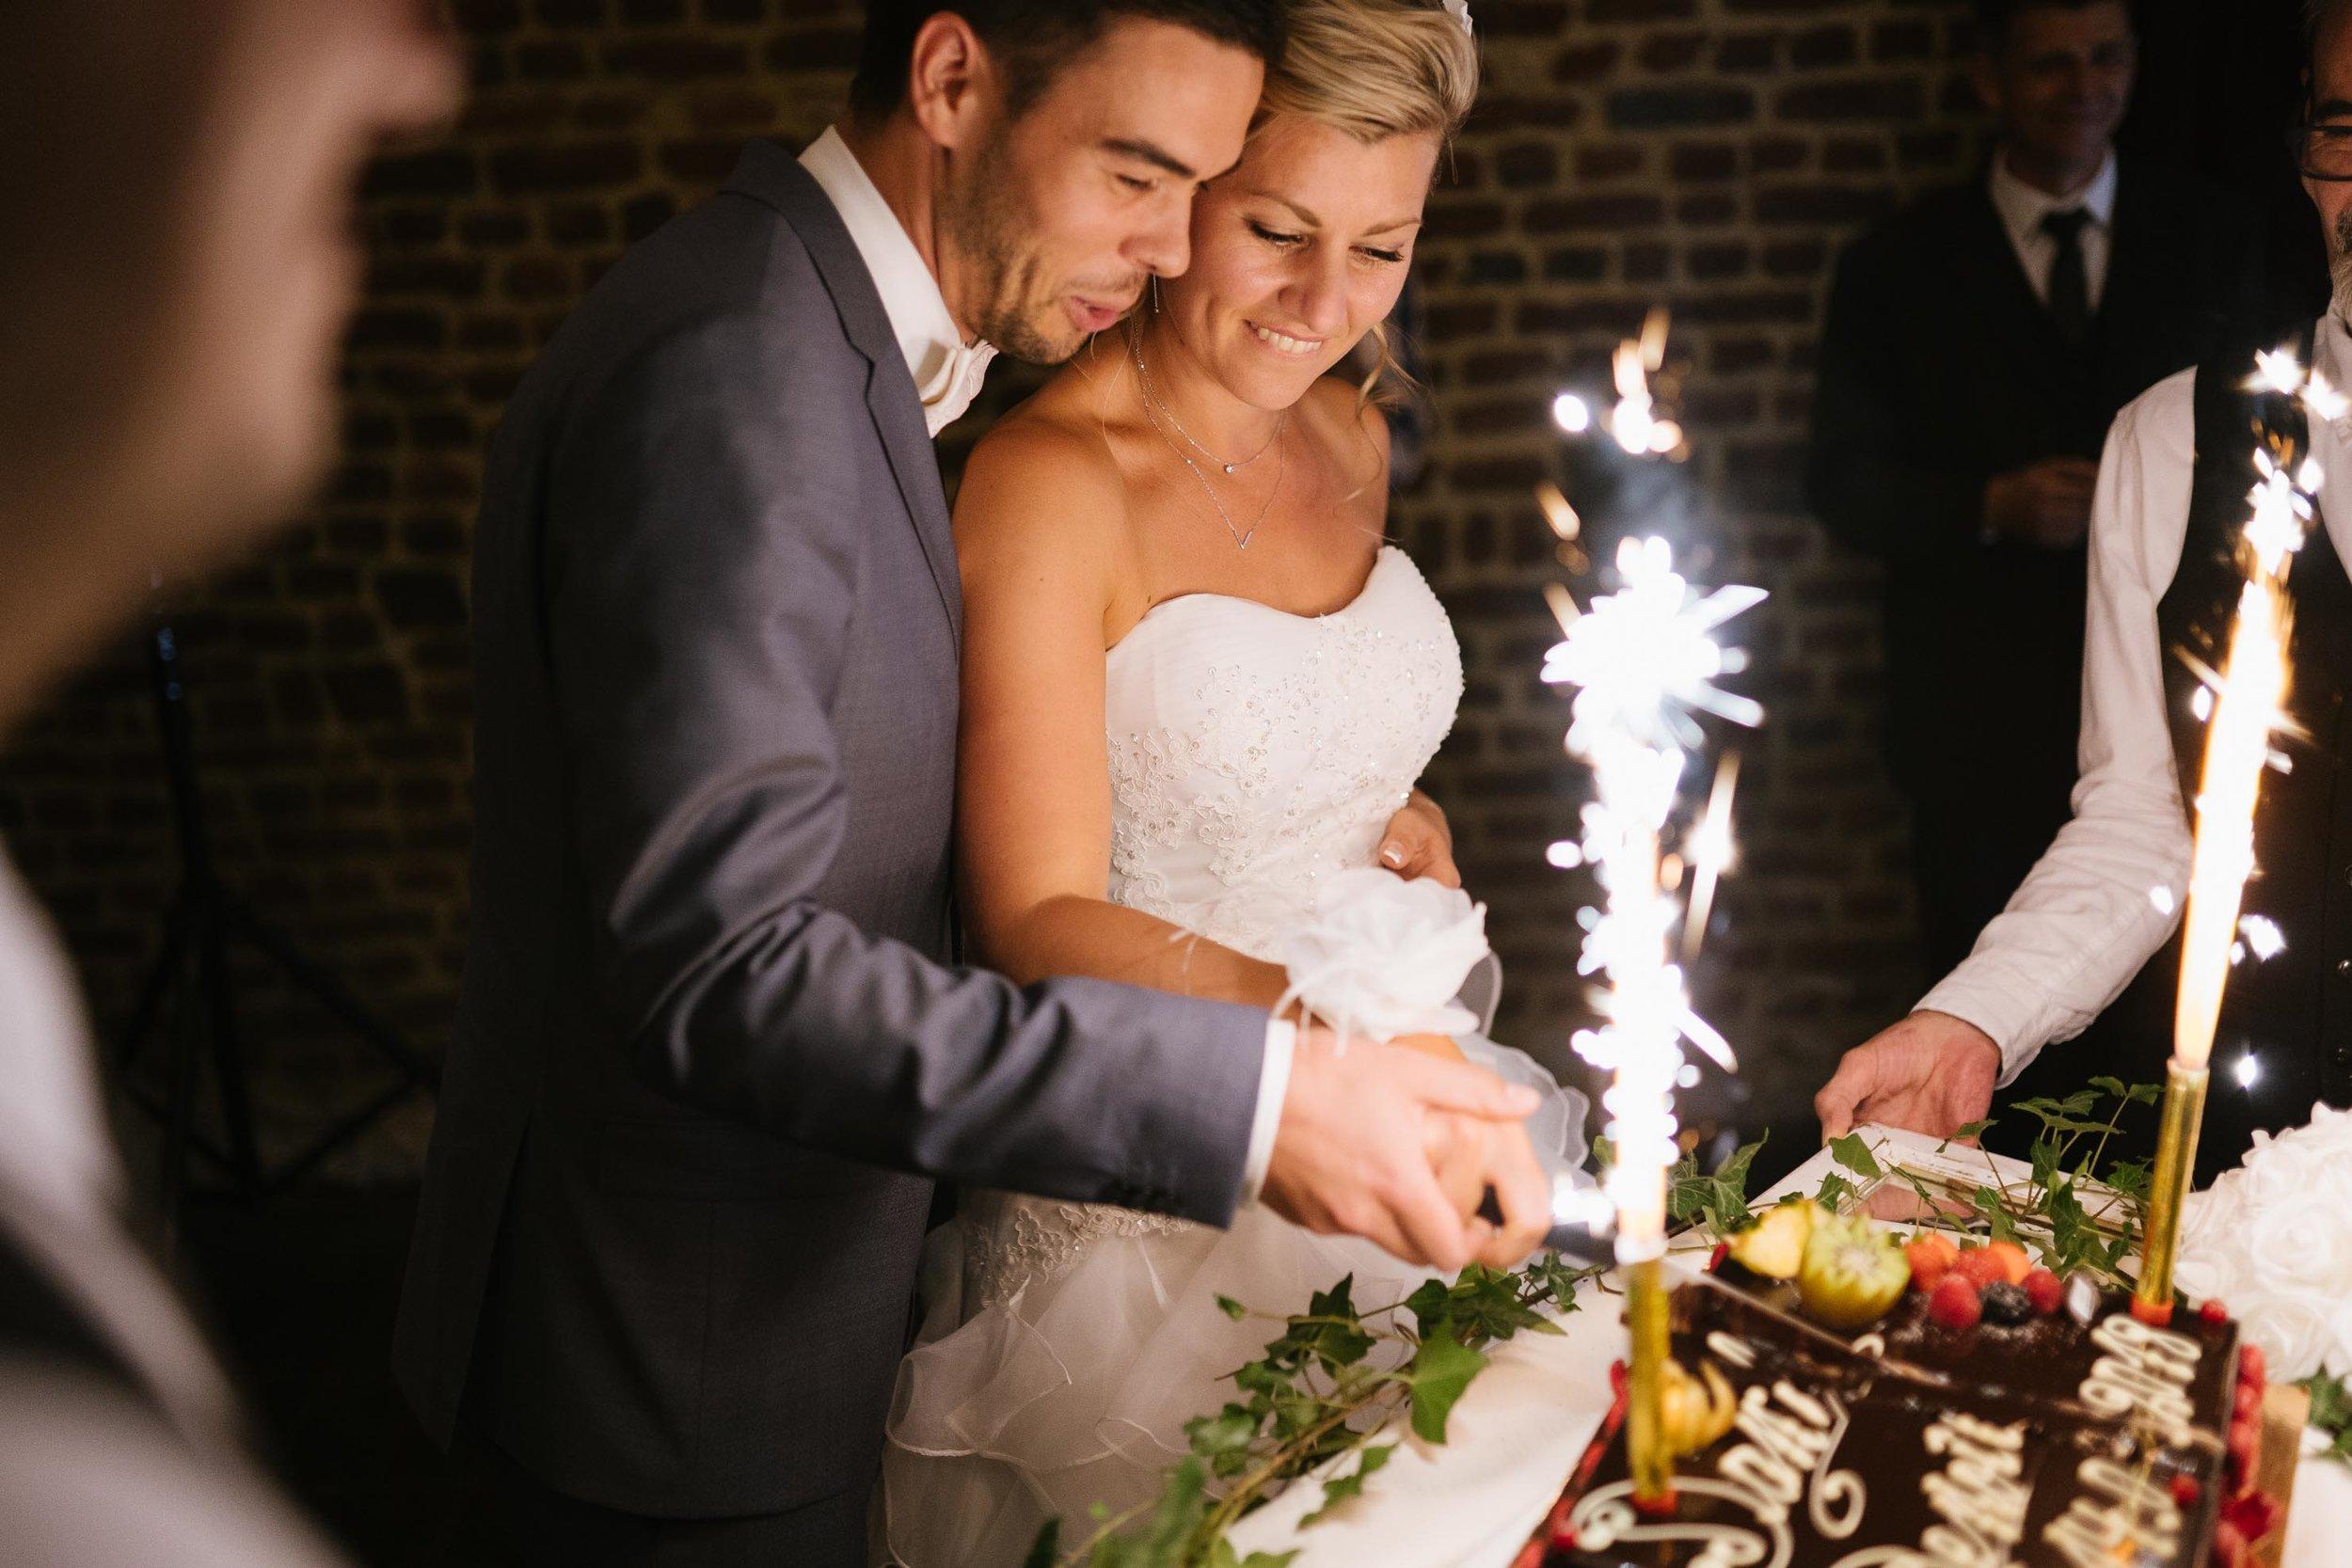 photographe-videaste-bruxelles-mariage-reportage-leleu-24.jpg